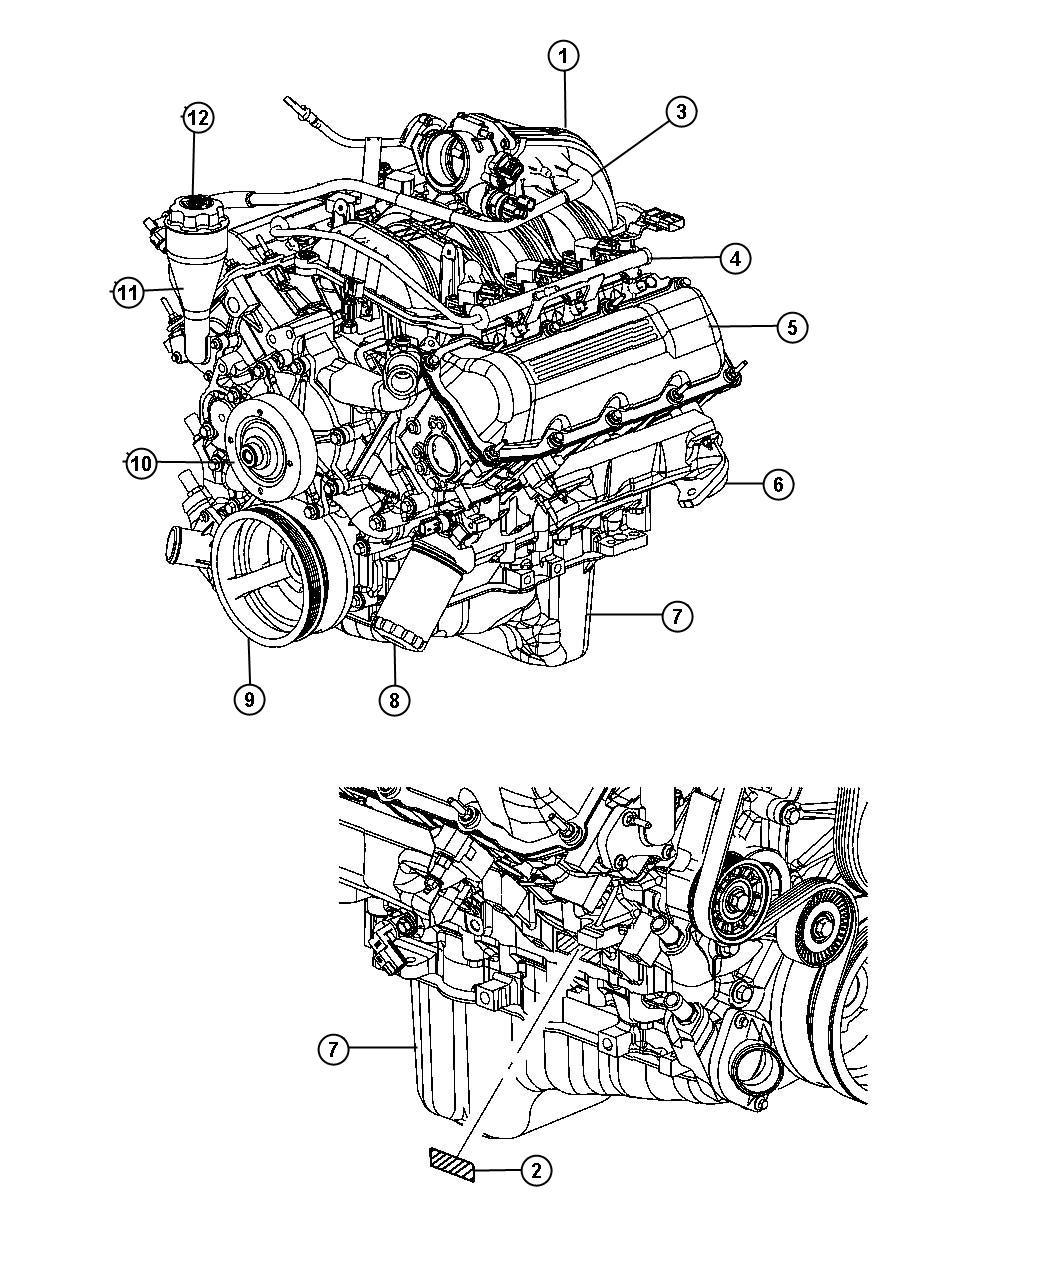 Jeep Grand Cherokee Cap Oil Filler 3 7l V6 Engine